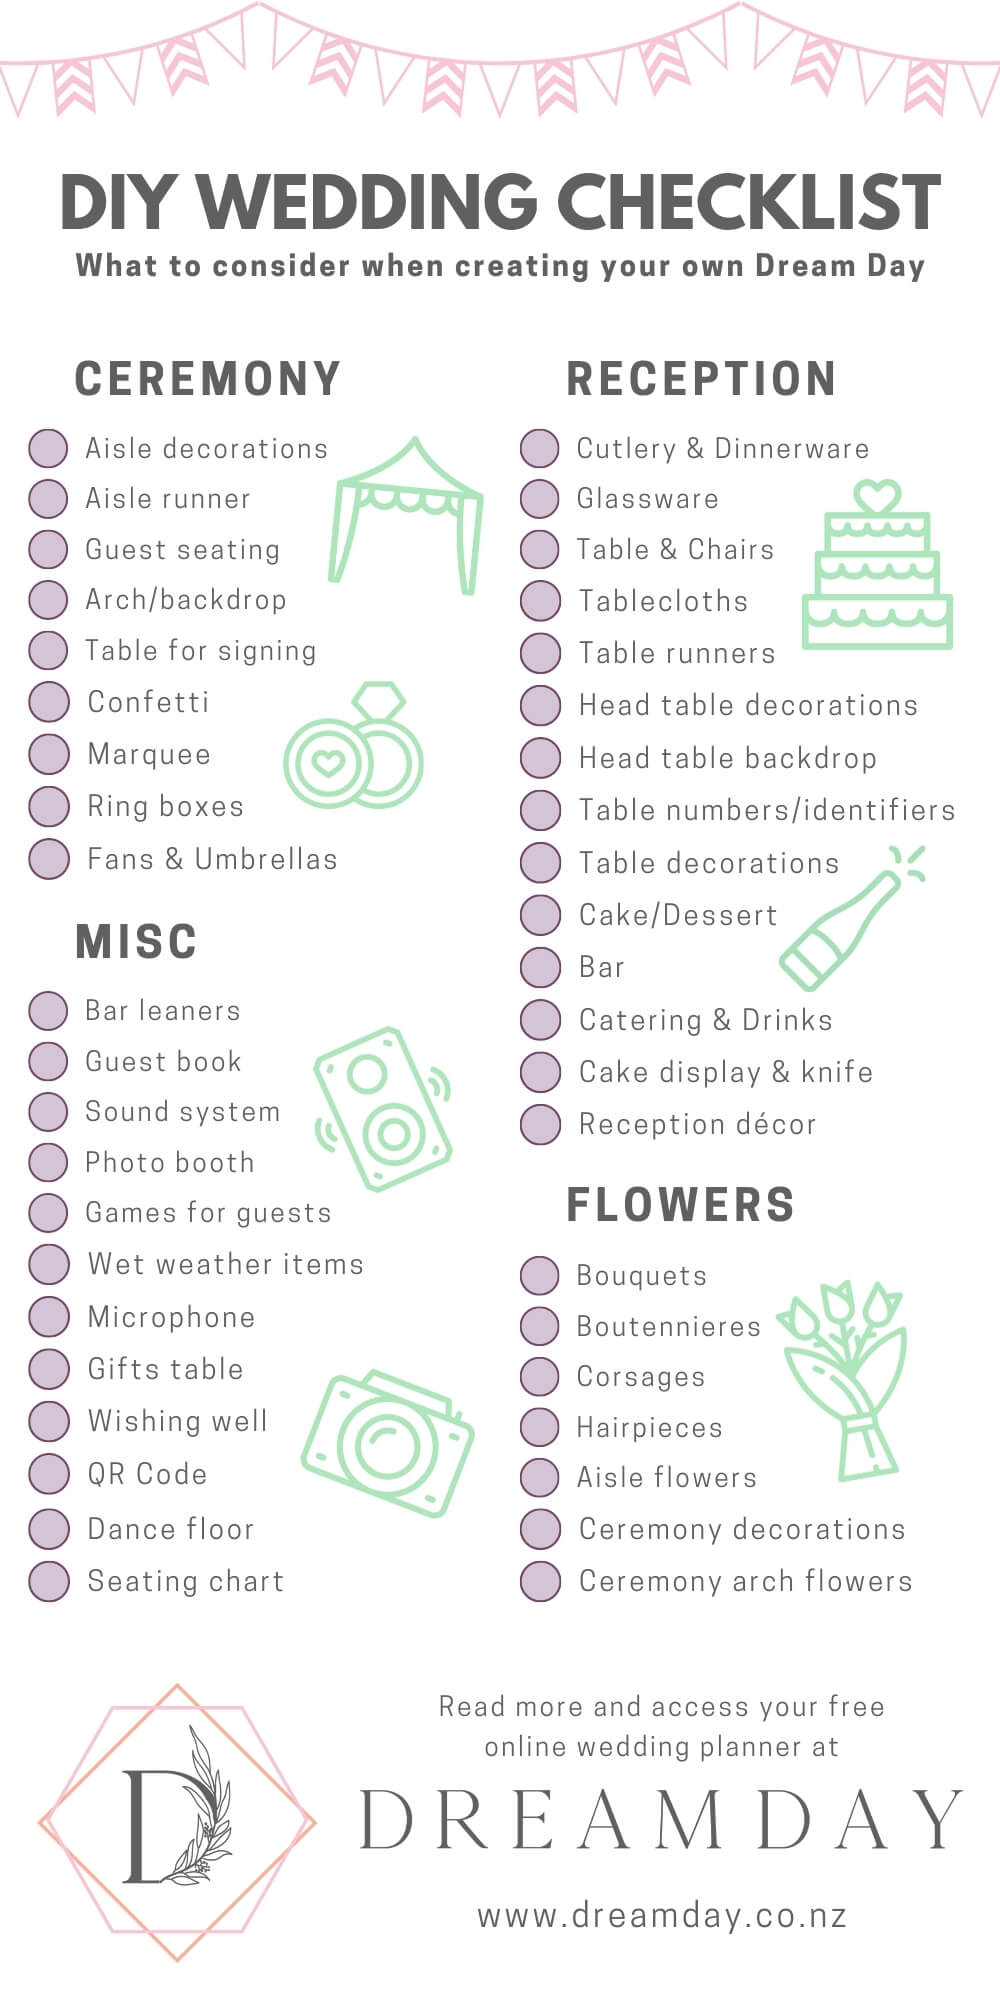 Checklist of DIY wedding items